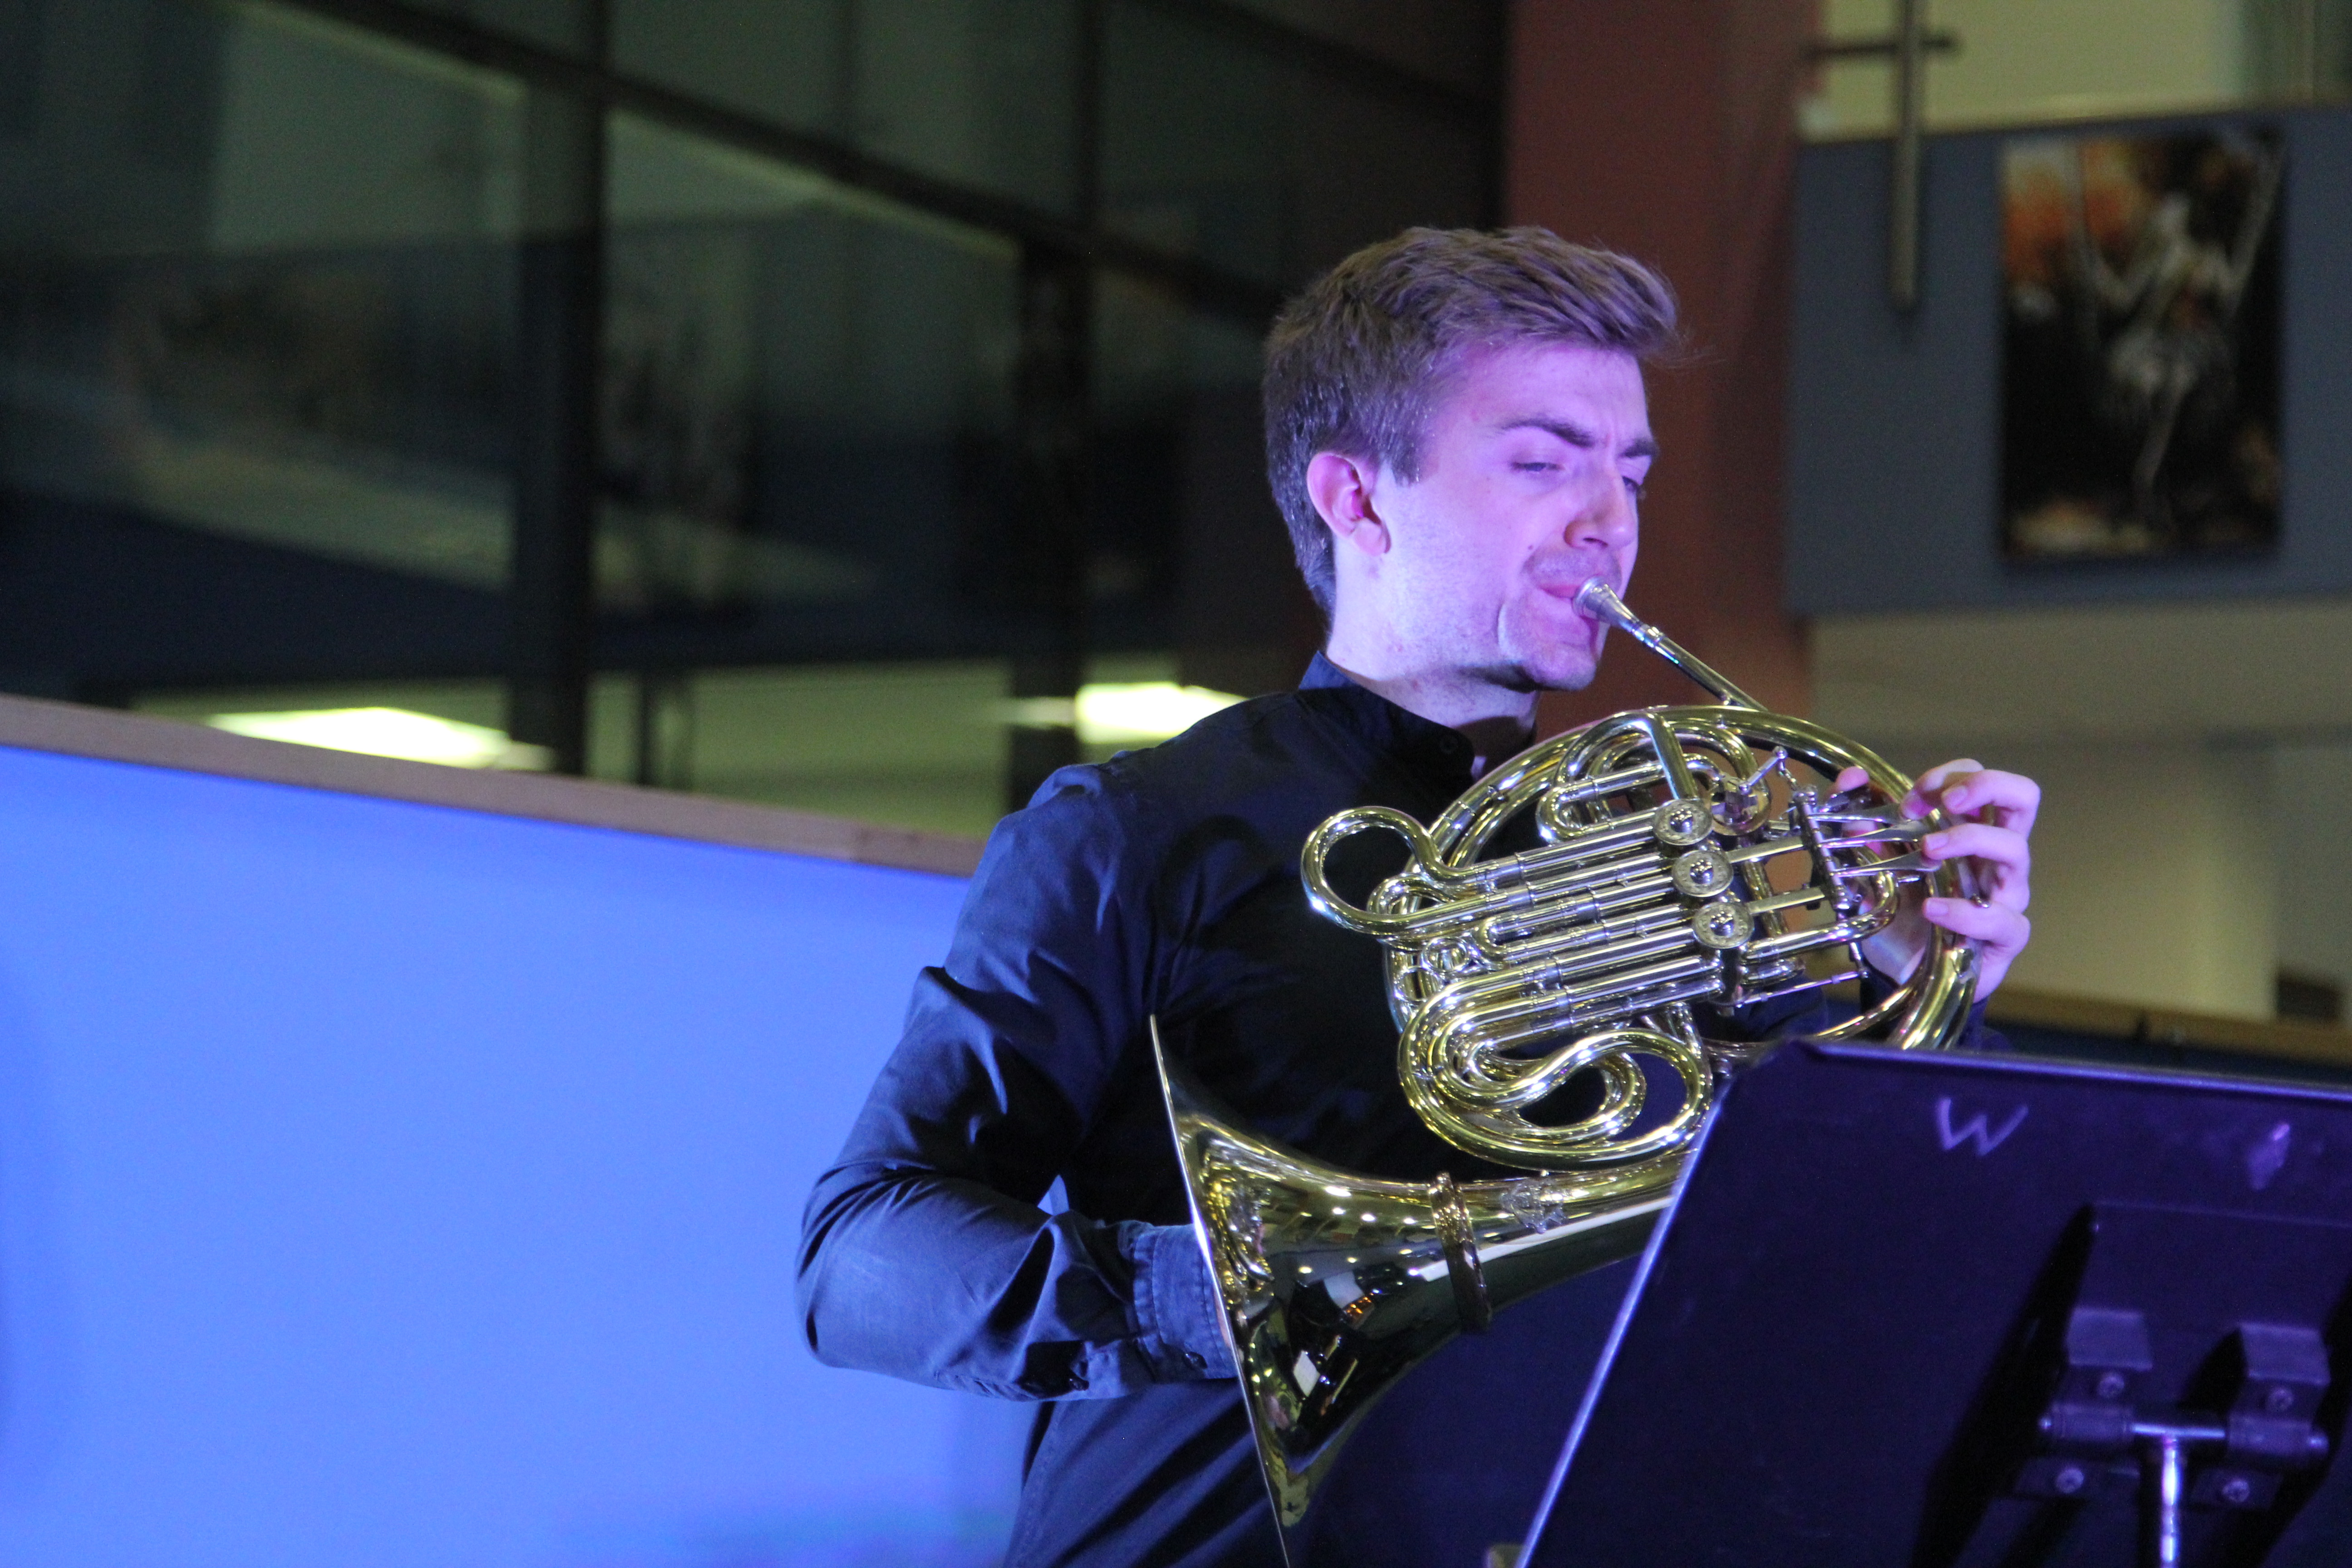 Ben Goldschieder performs at Writhlington School